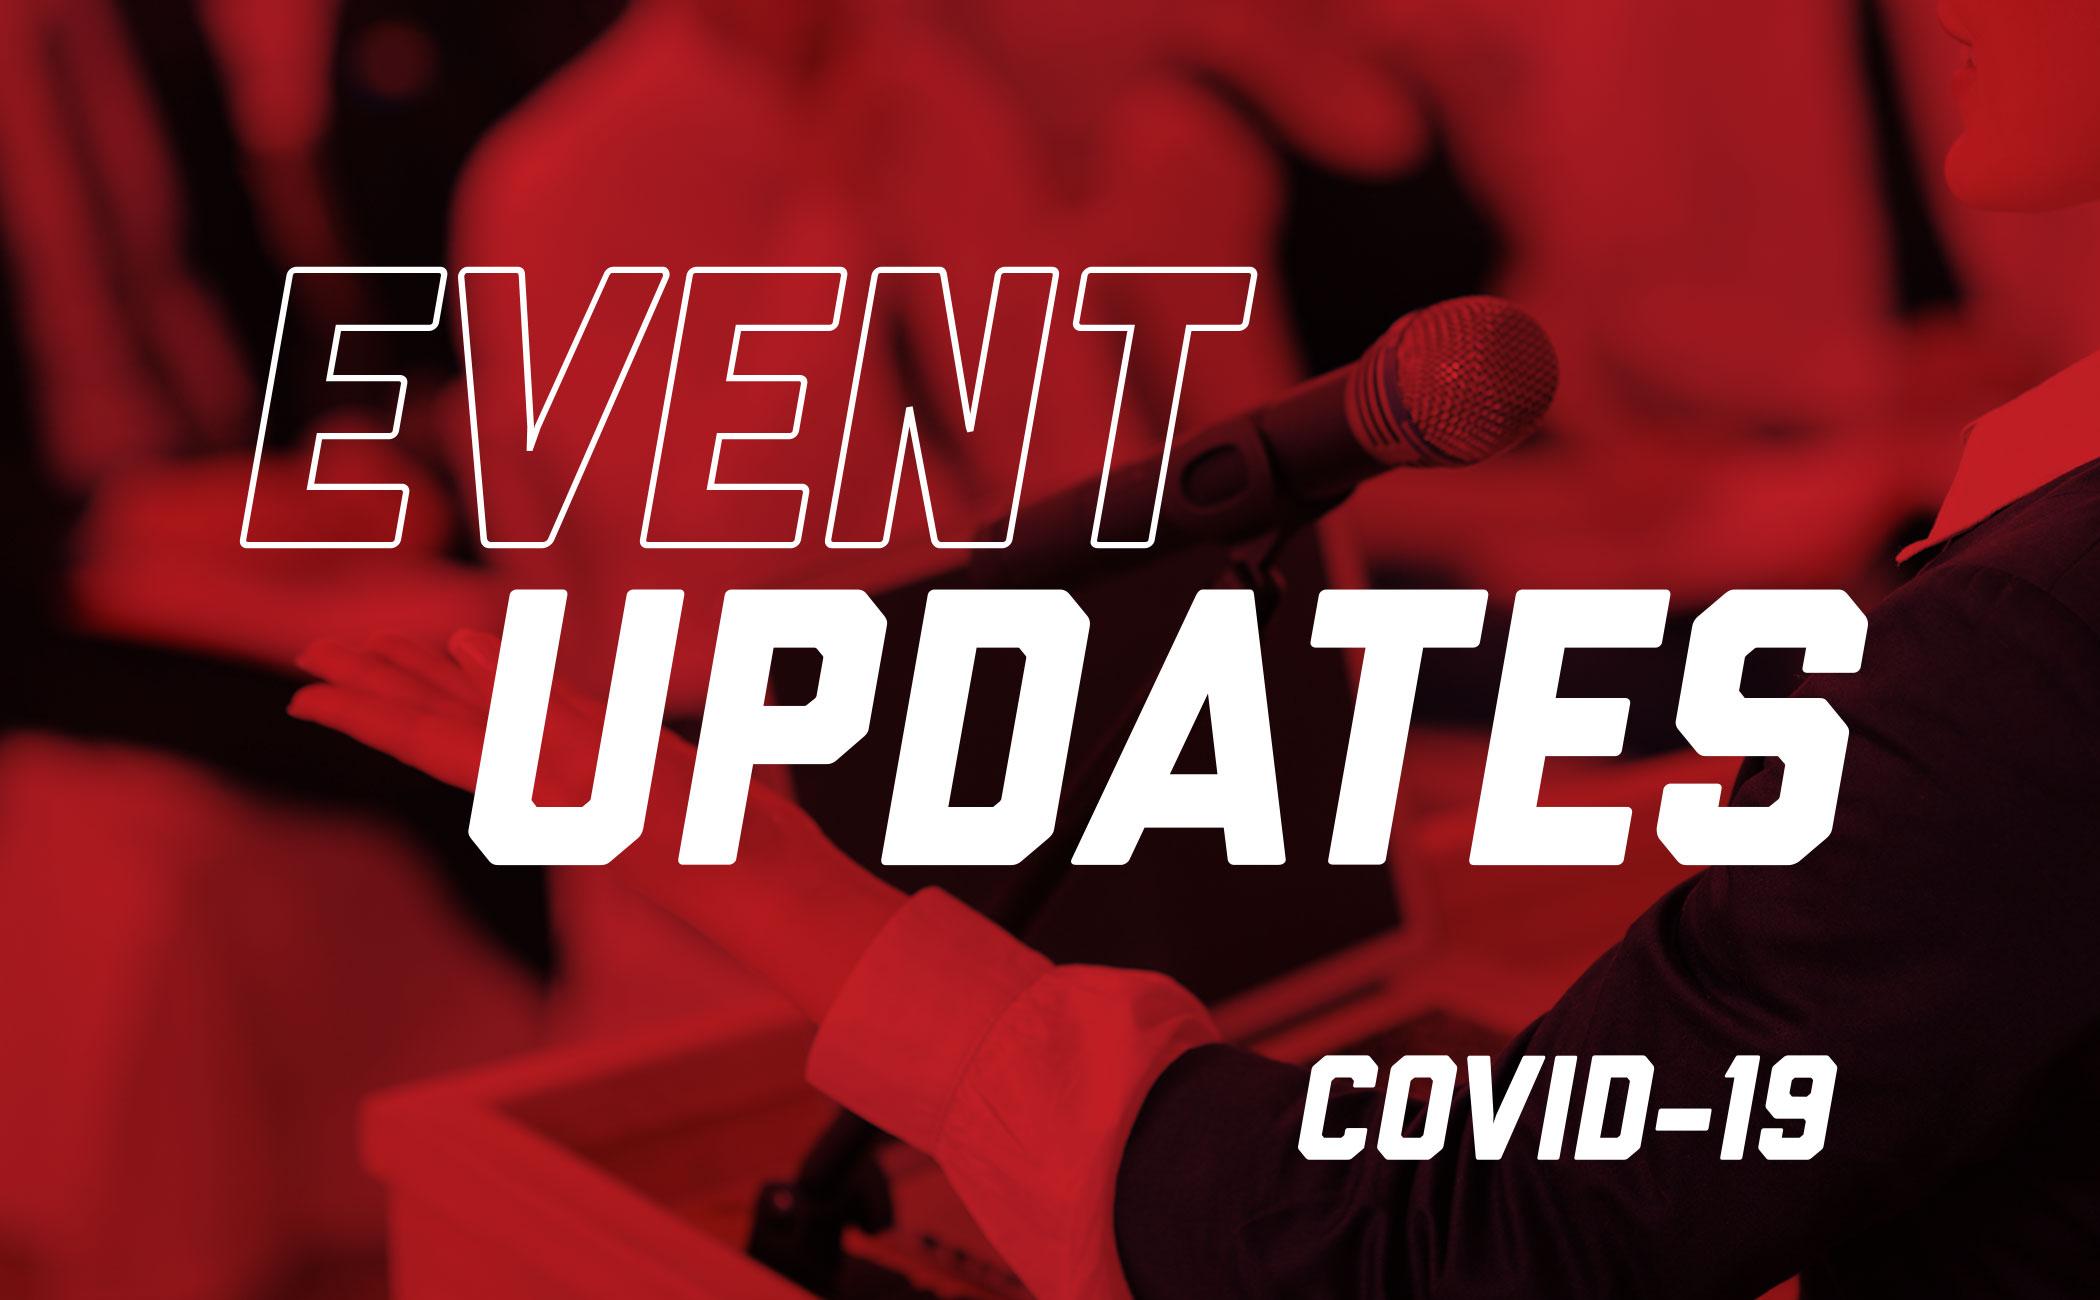 event updates covid-19